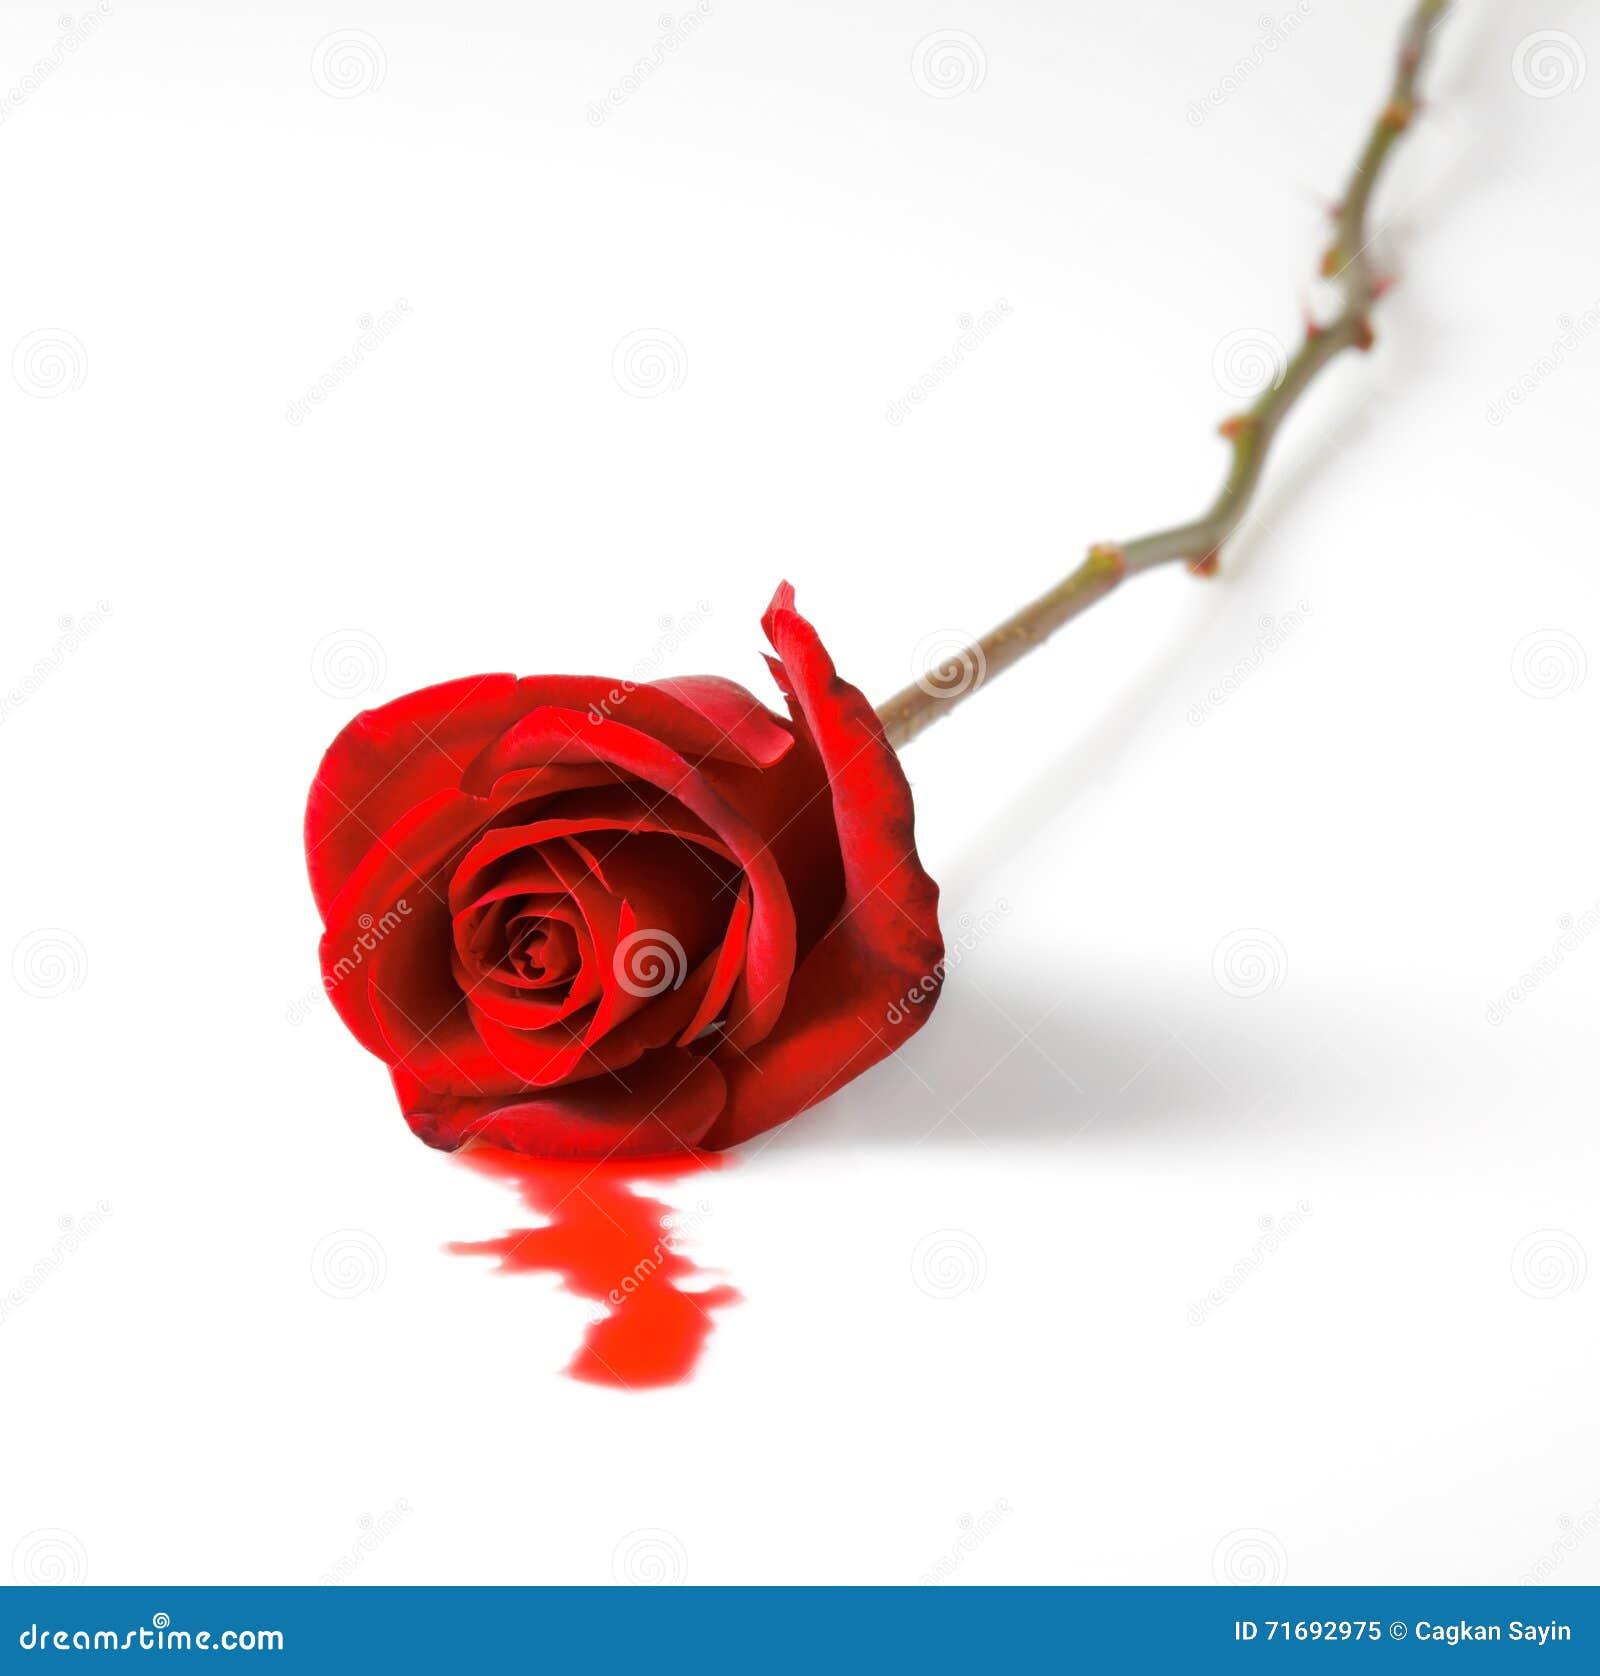 Bleeding red rose stock image image of romantic death 71692975 download bleeding red rose stock image image of romantic death 71692975 mightylinksfo